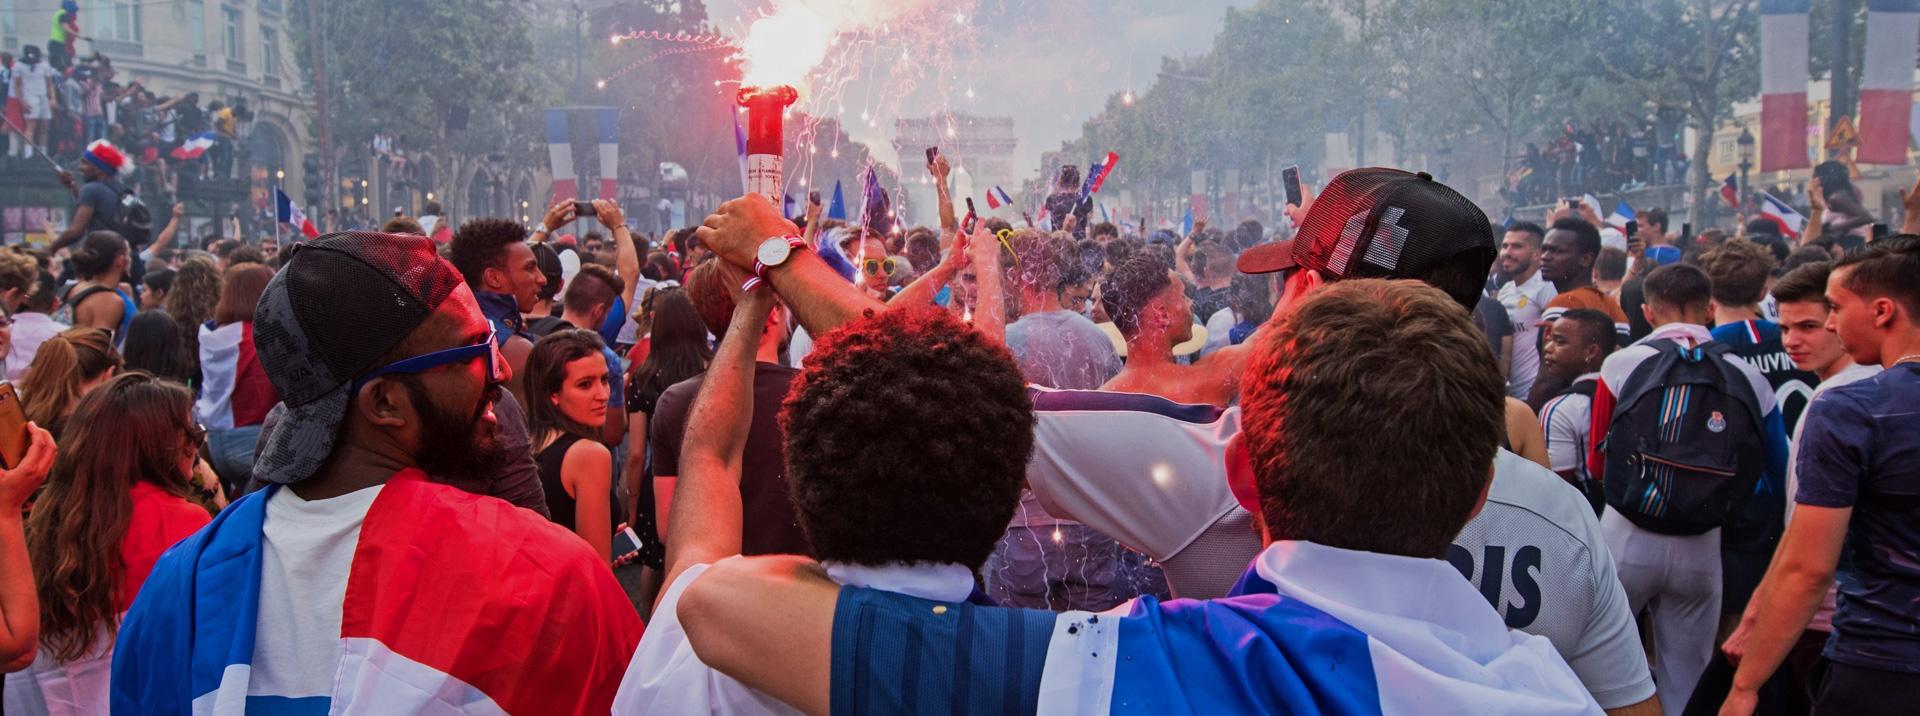 Paris interns celebrating the world cup